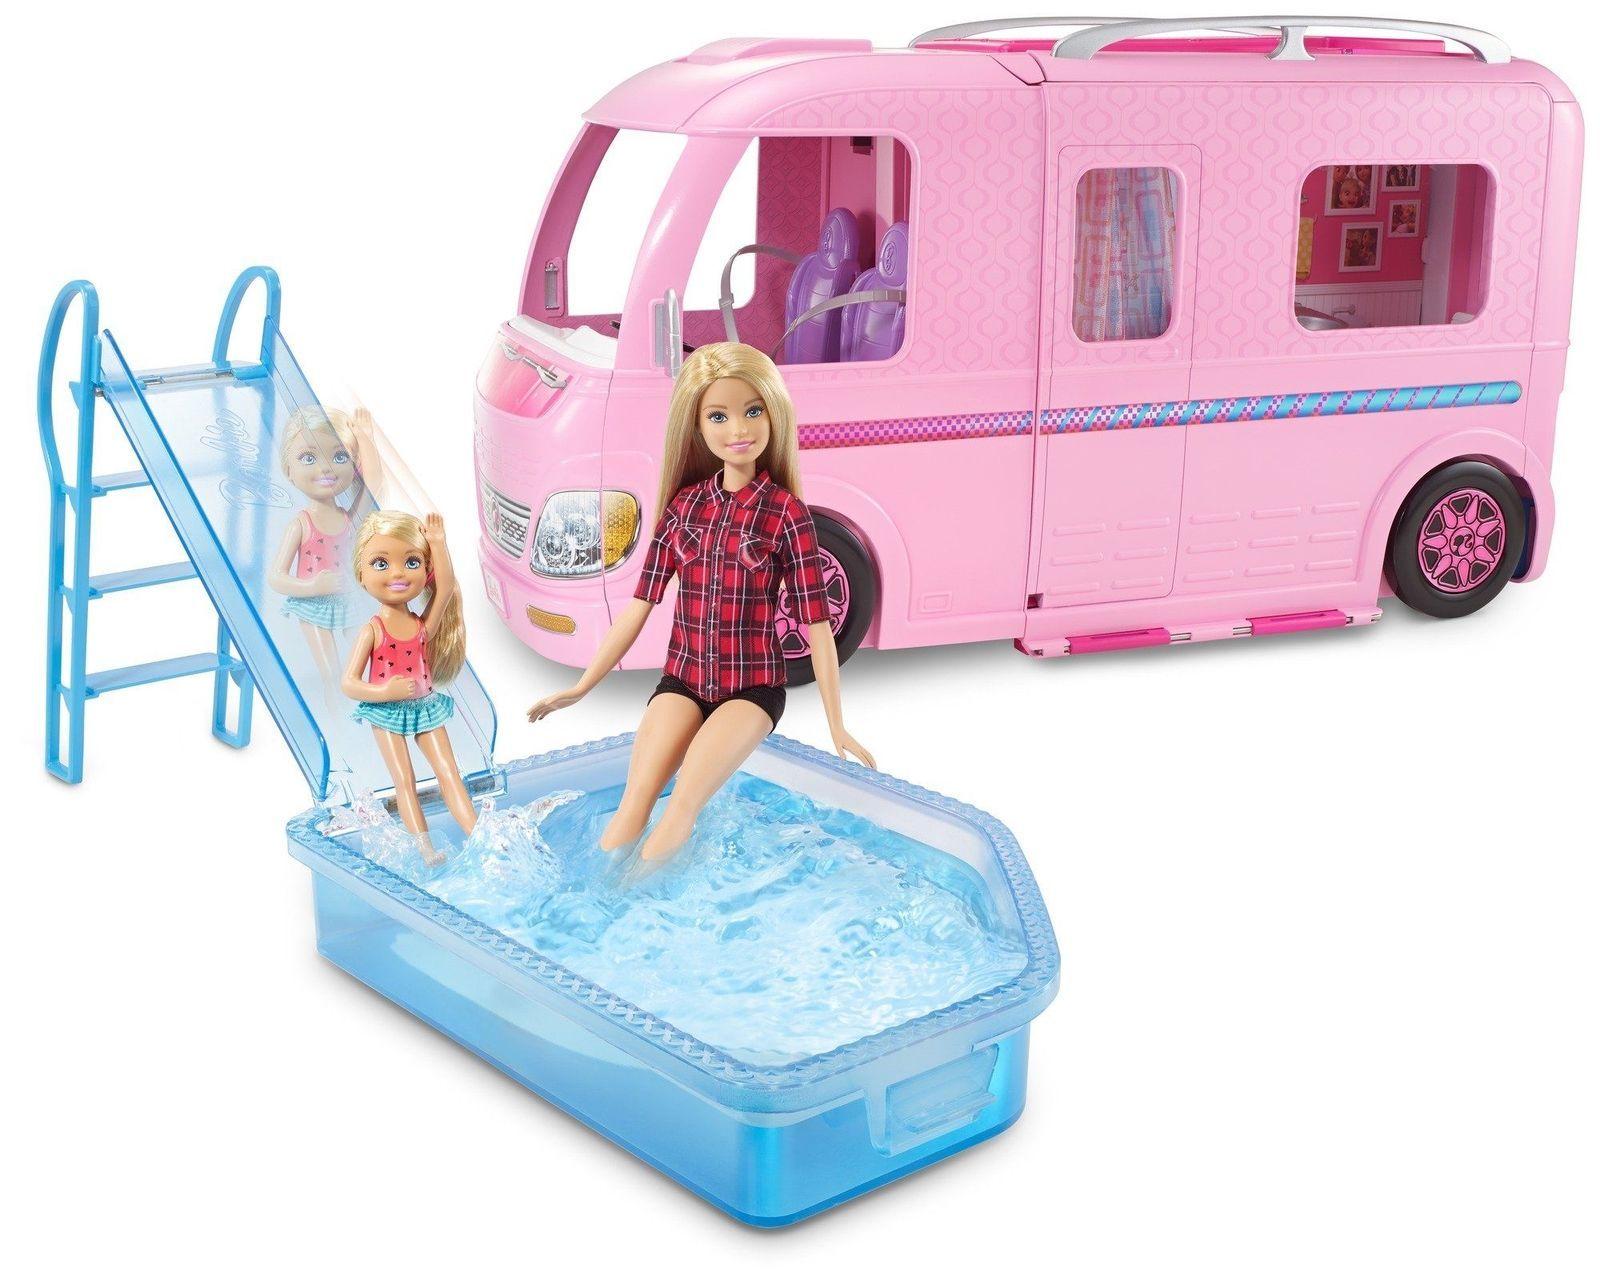 Barbie RV Campsite Play Set Dolls Family Ken Dream Camper Swimming Bedroom Slide